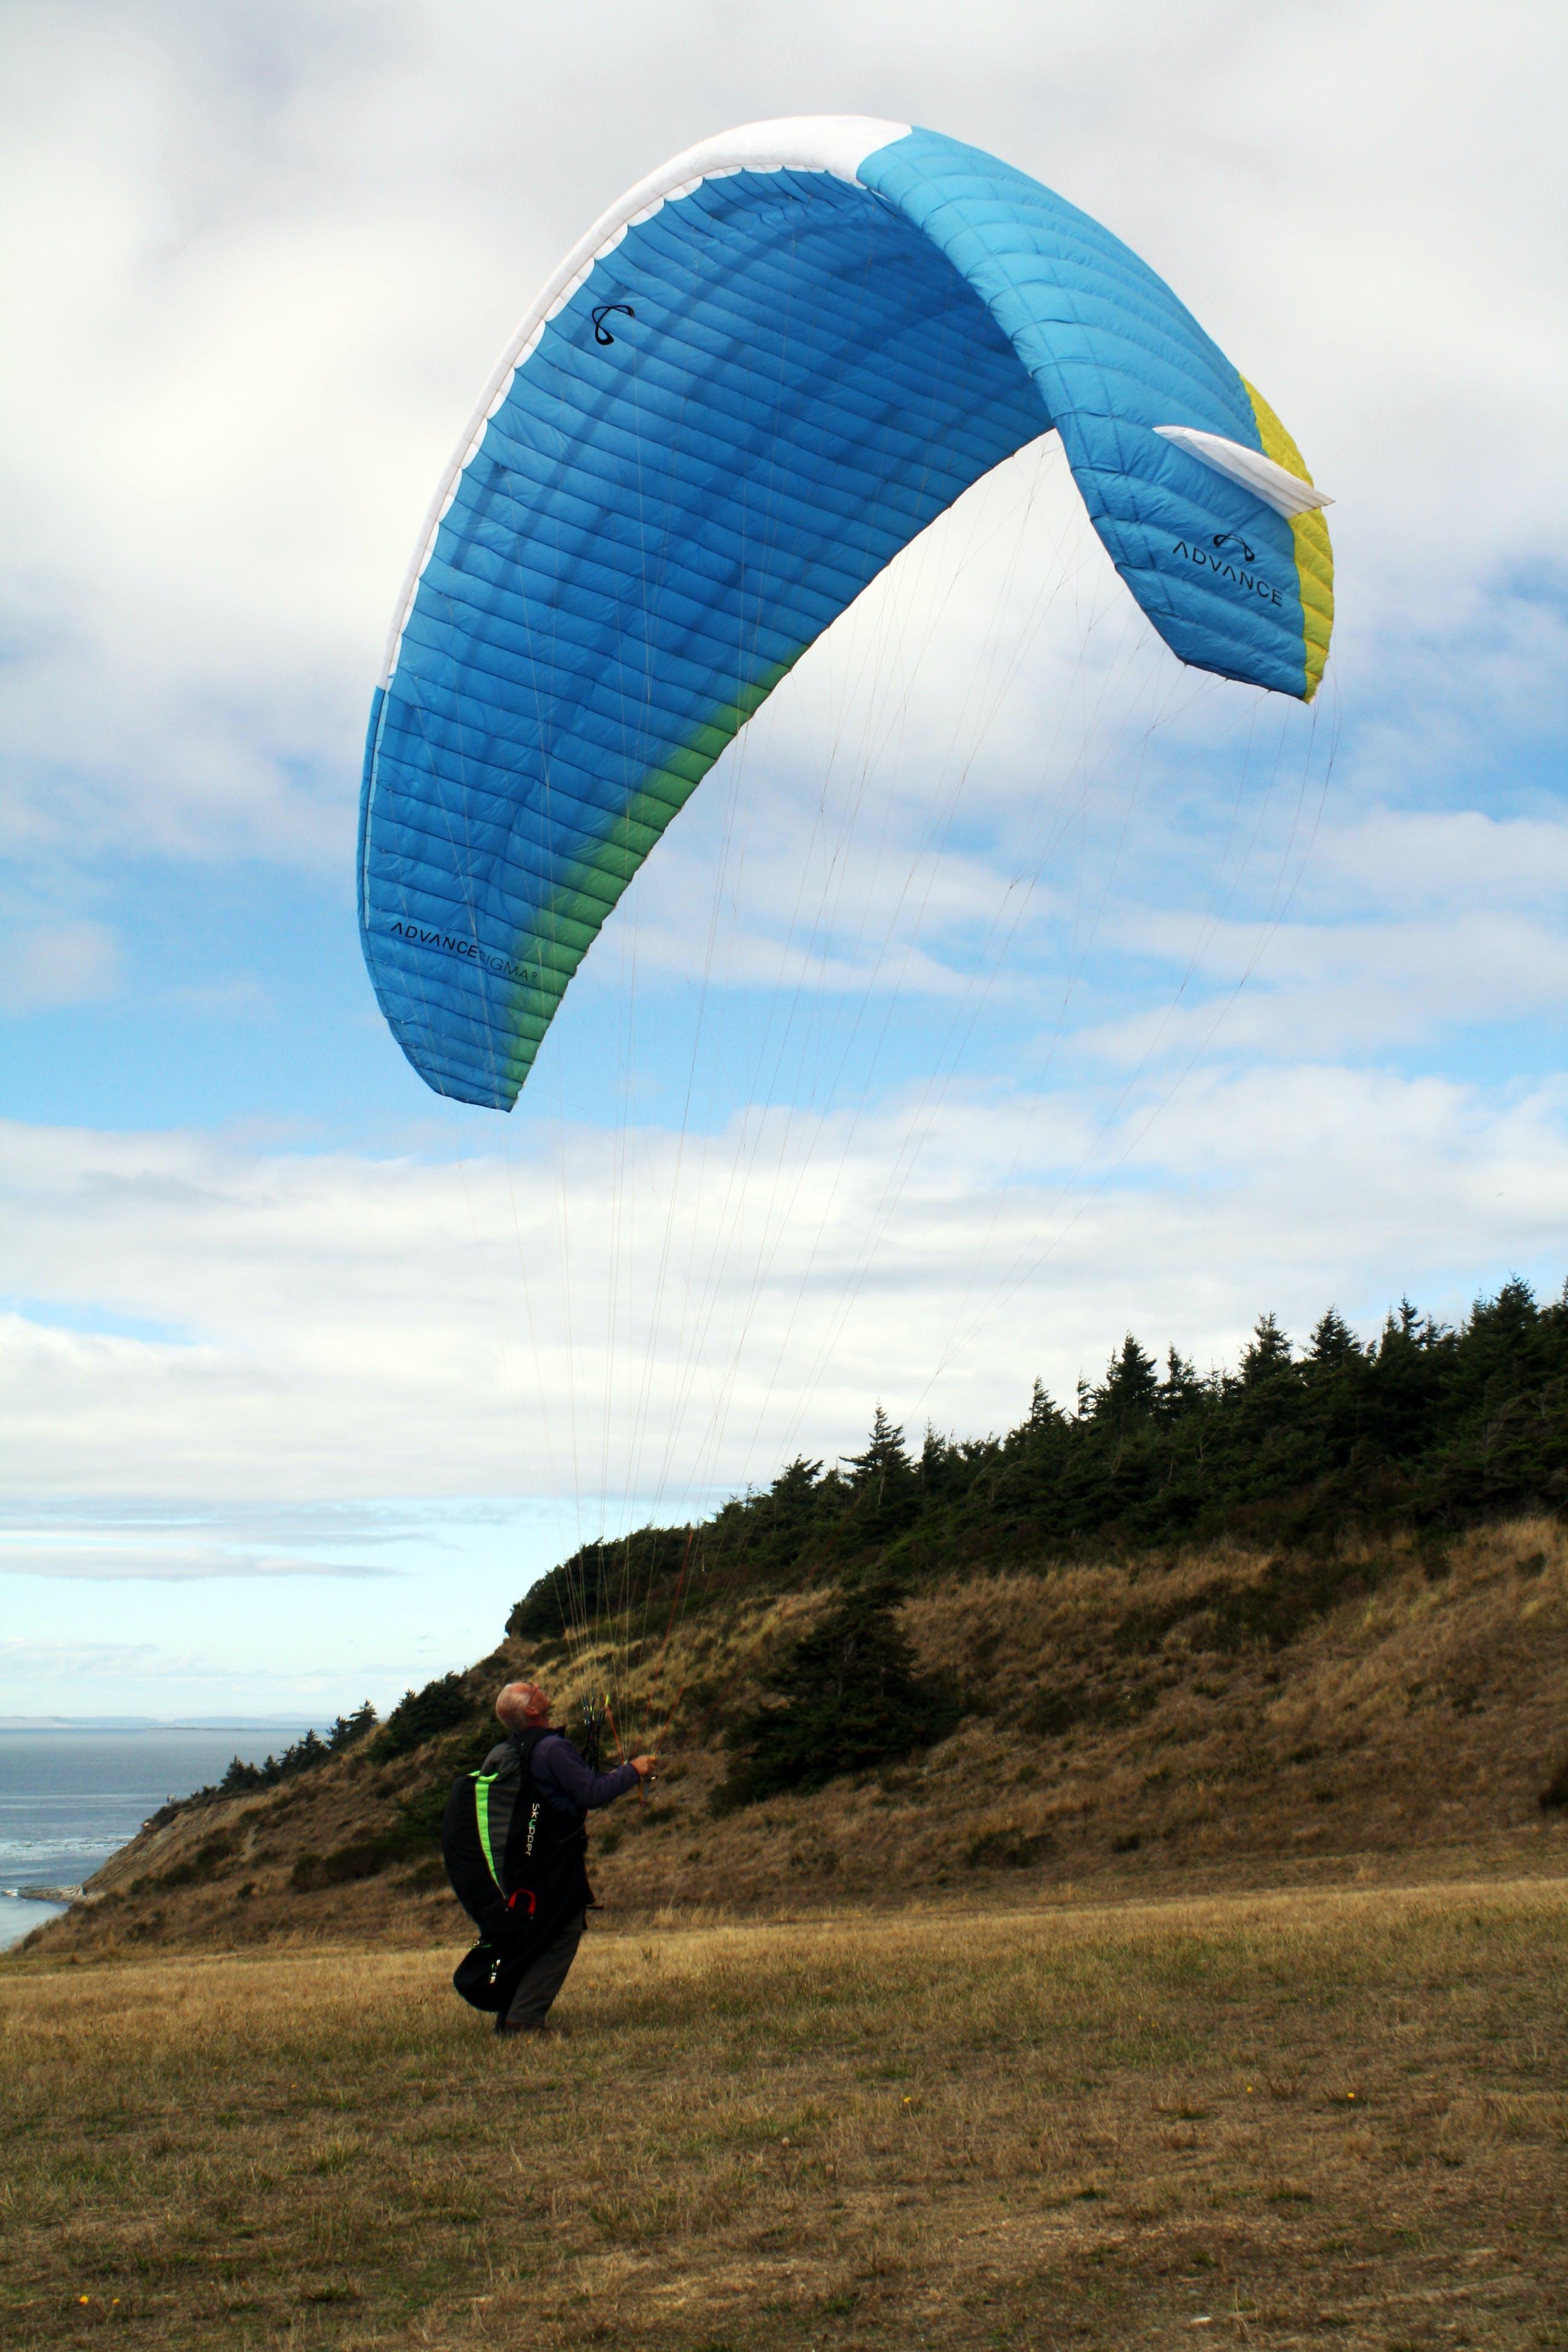 adventure, paraglider, paragliding